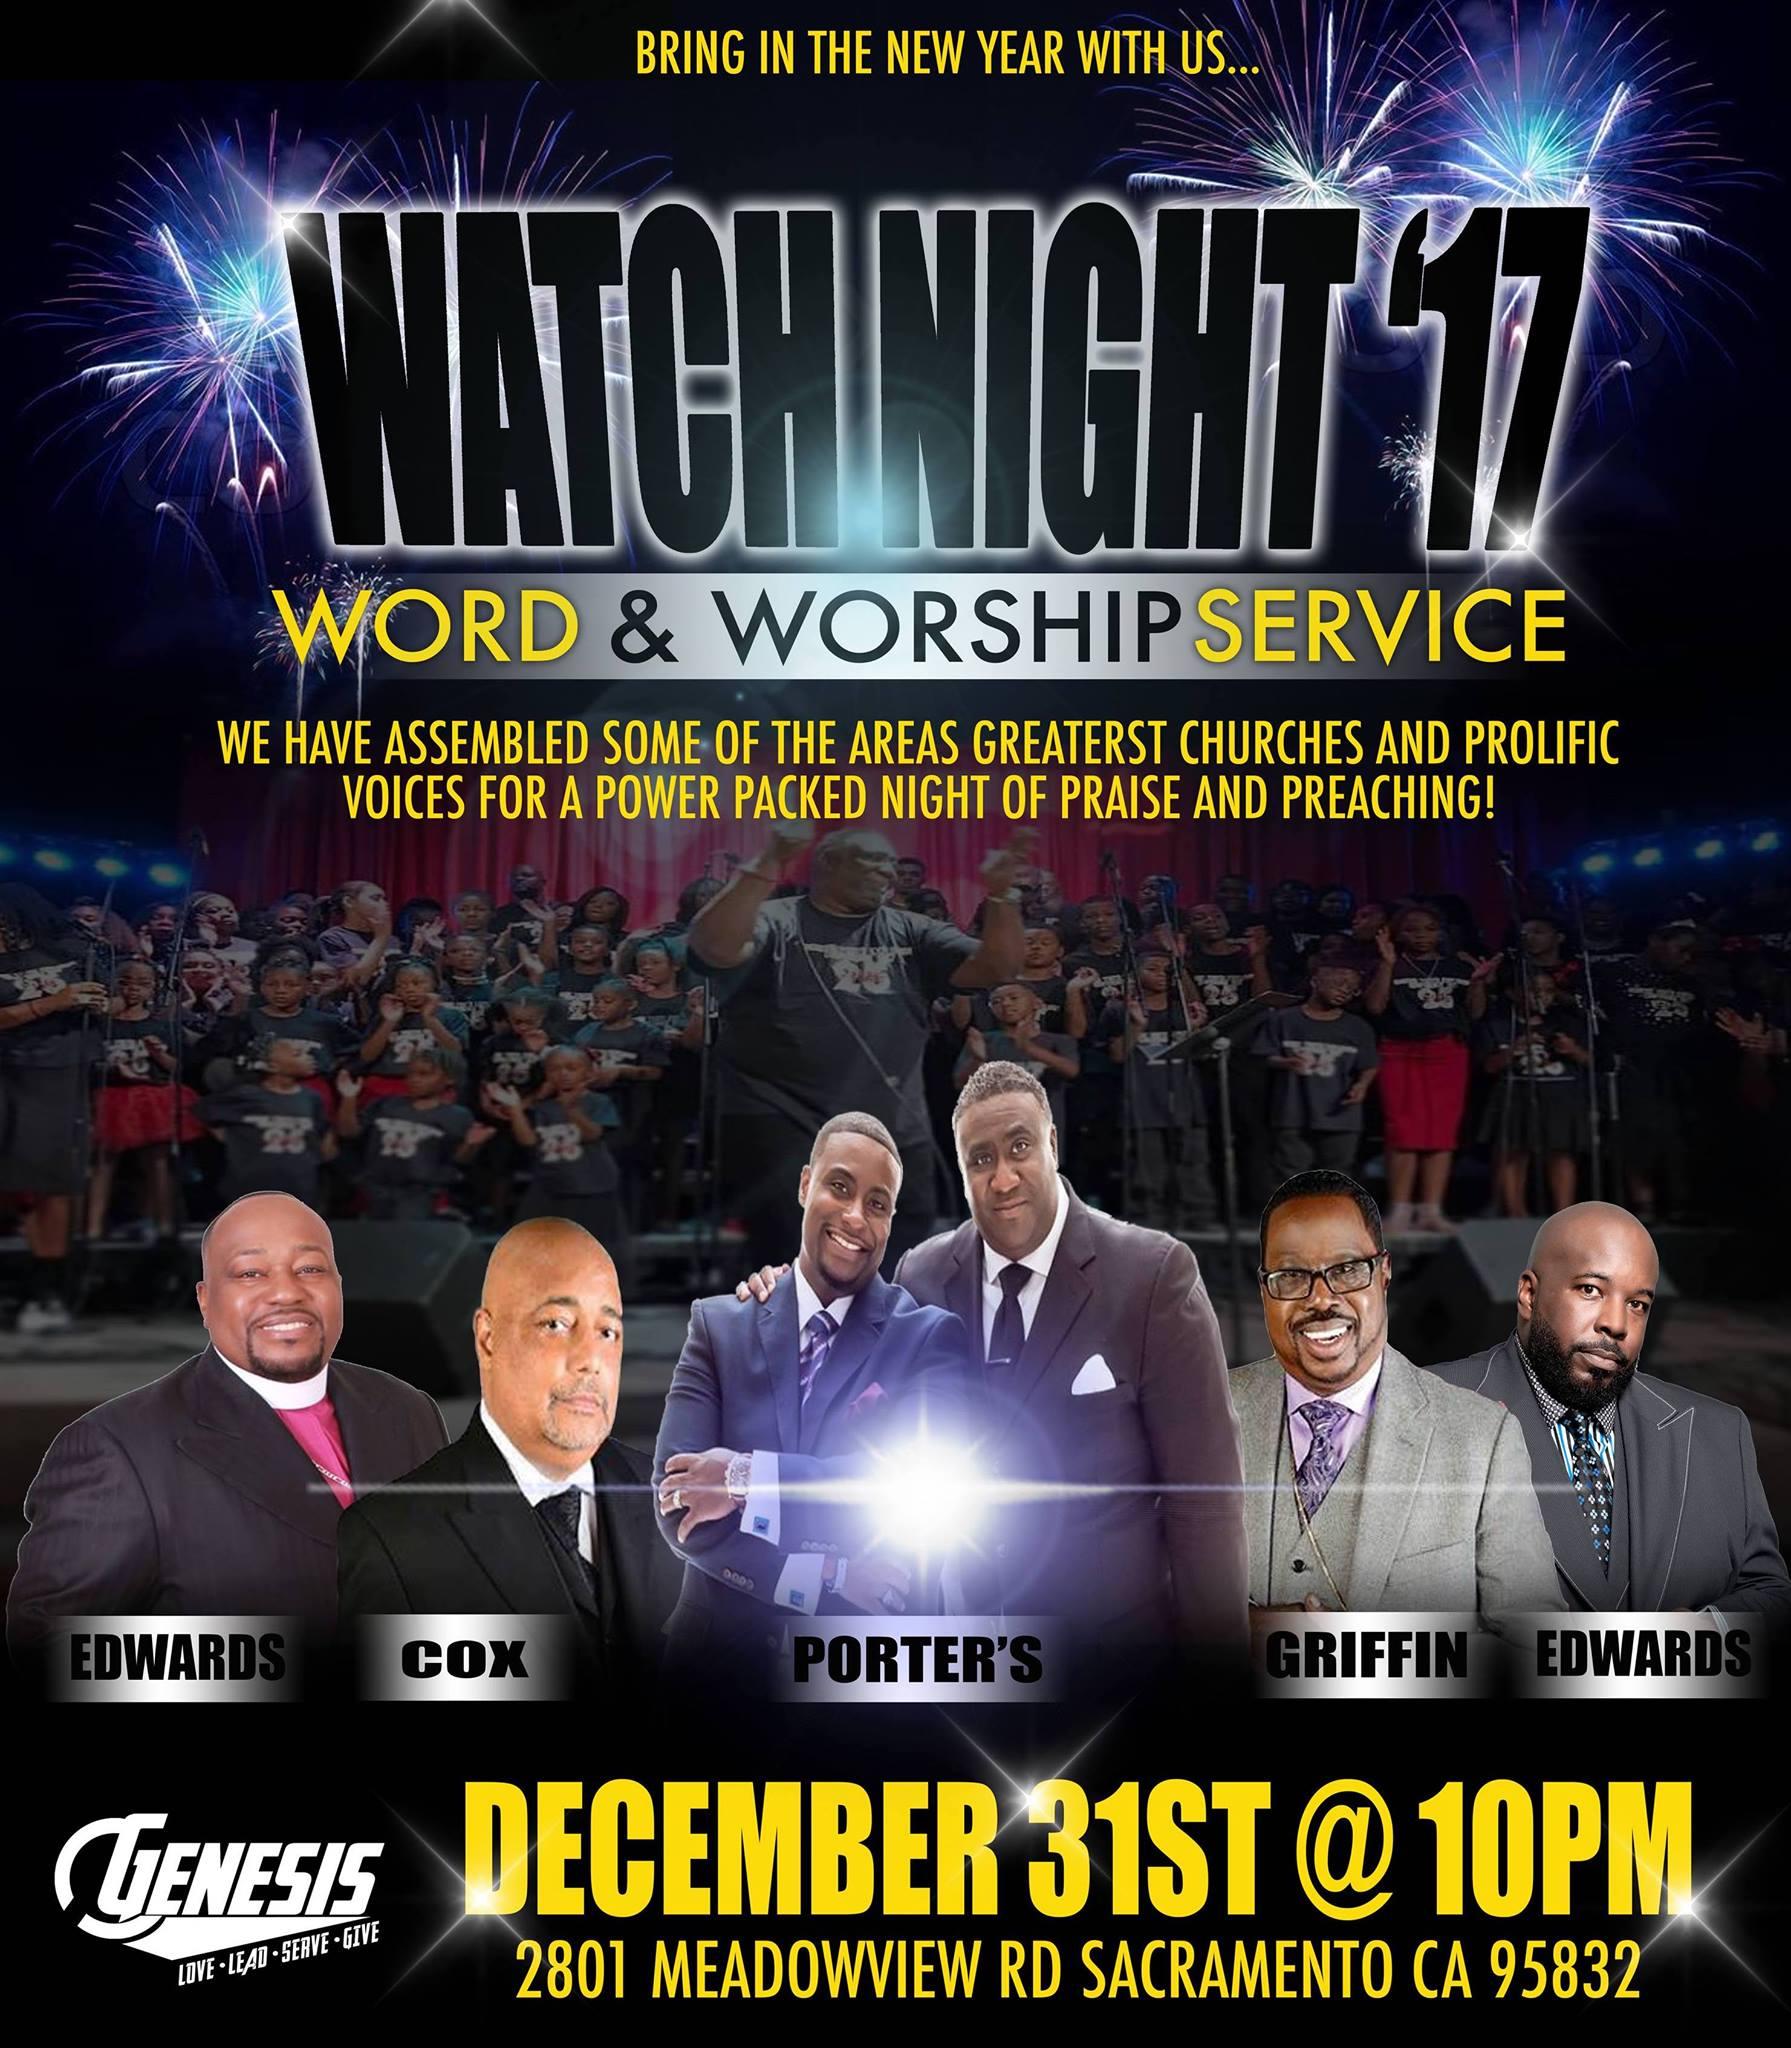 Genesis Church Watch Night Word & Worship Service